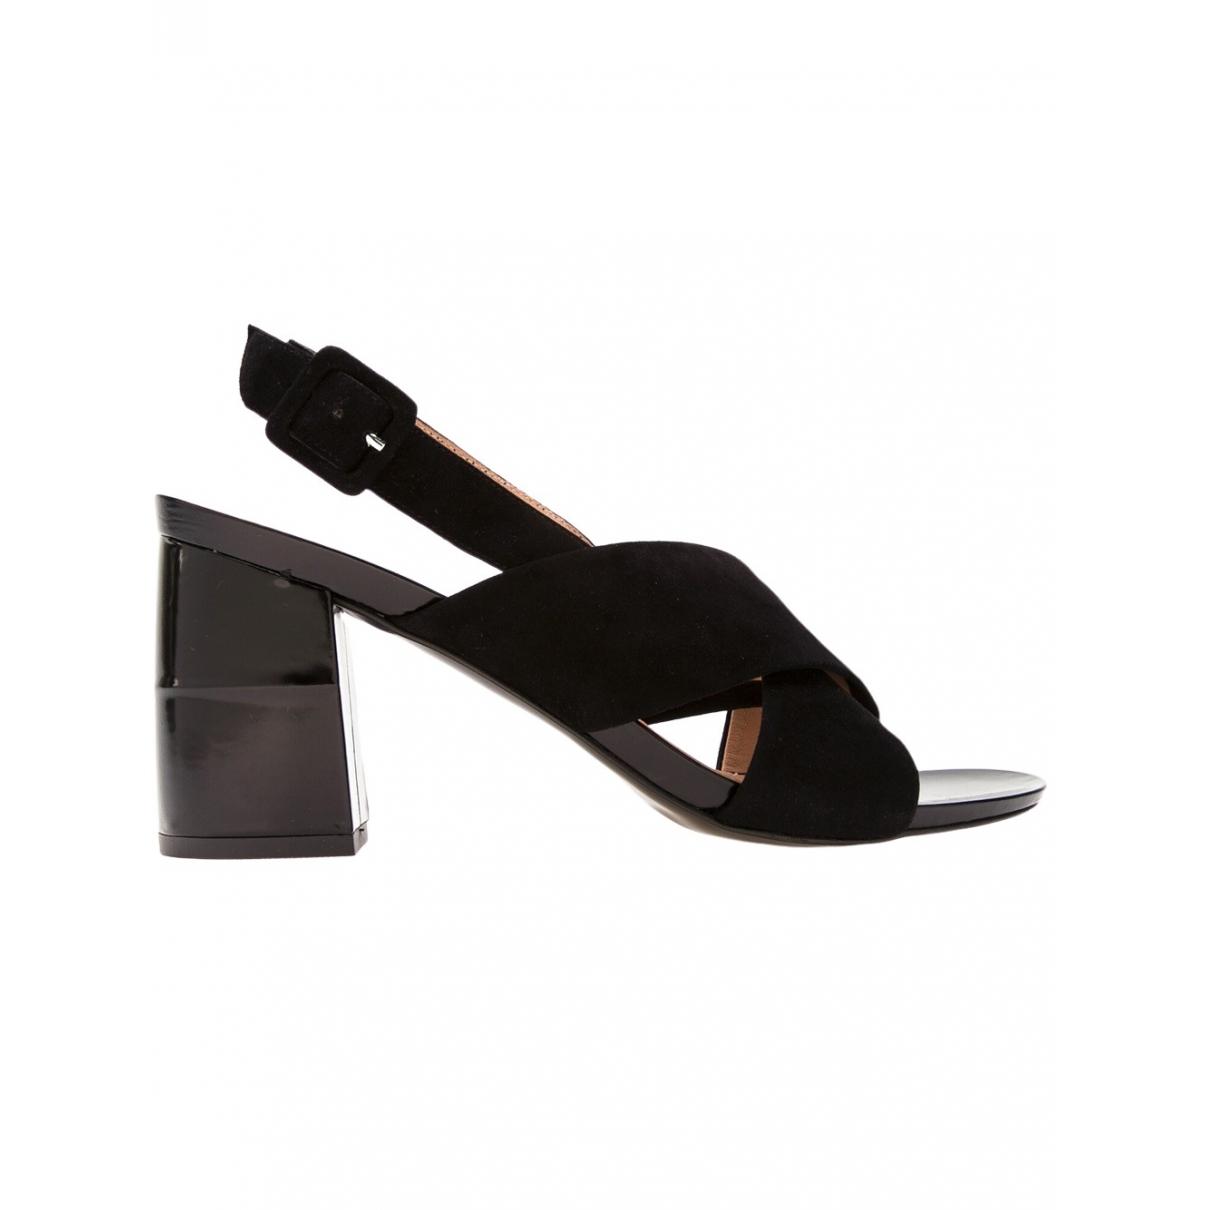 Robert Clergerie \N Black Suede Sandals for Women 37.5 EU